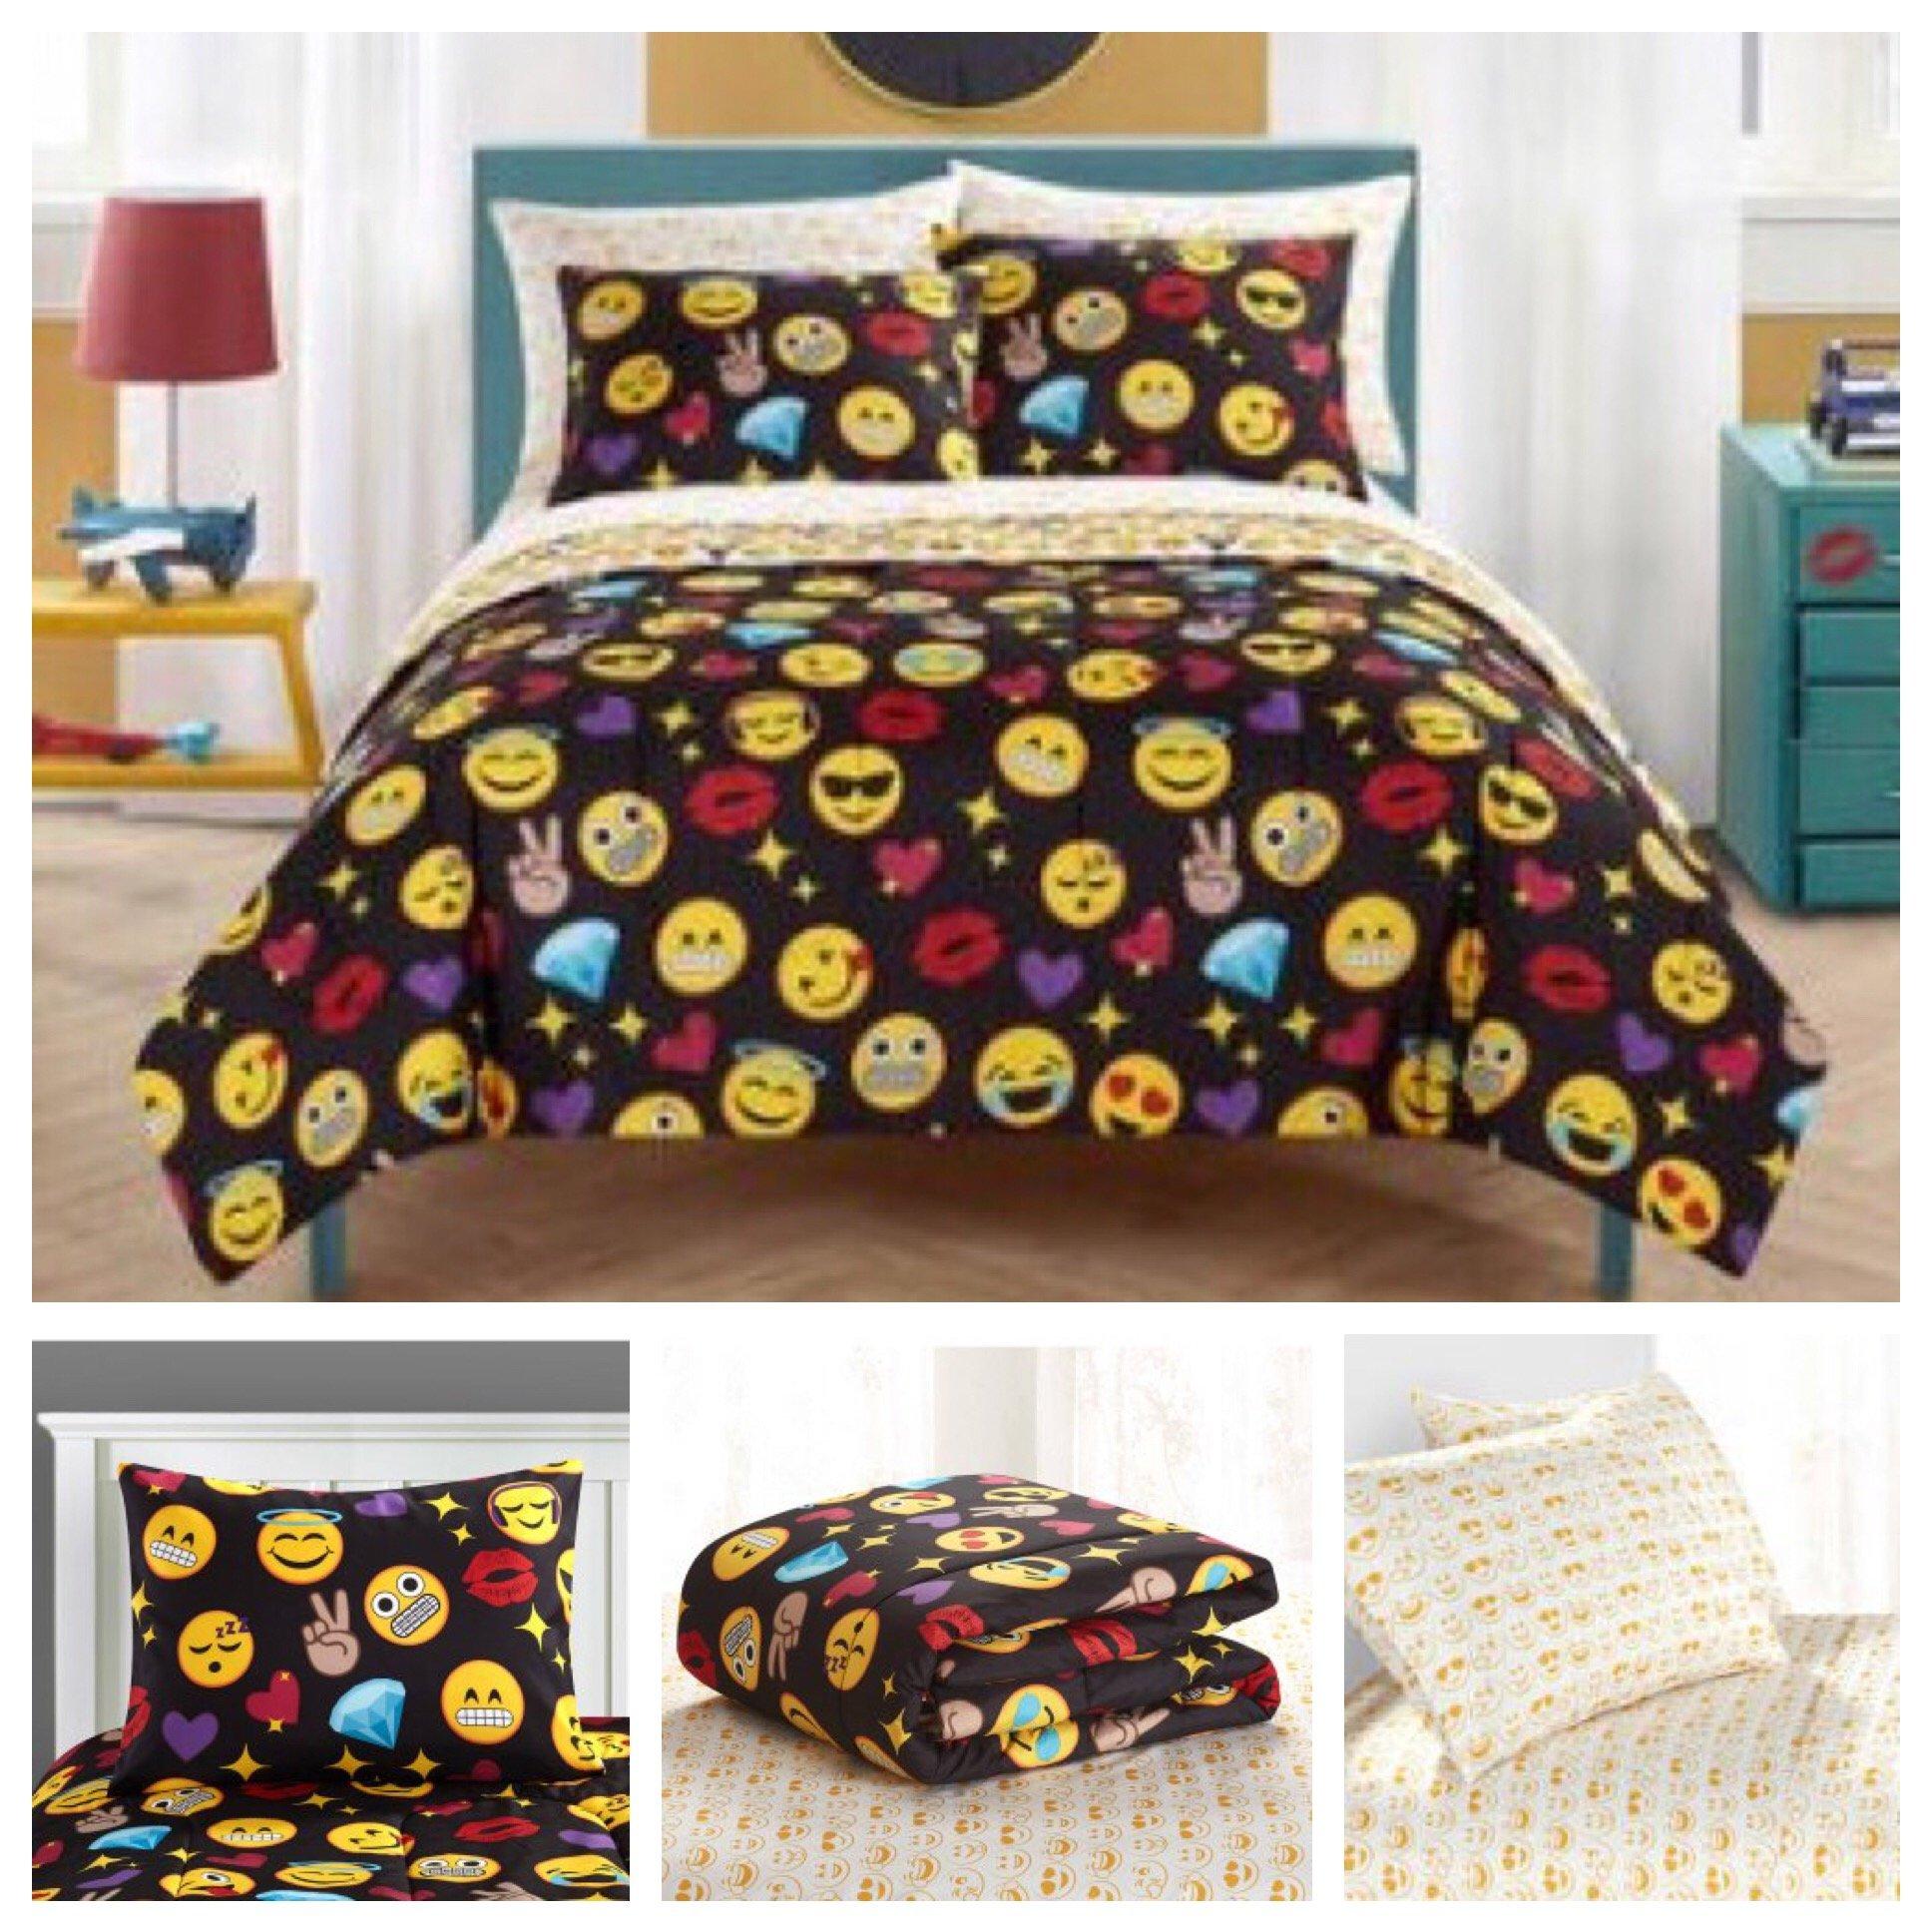 Emoji Complete 7 Piece Reversible Bedding Comforter Set - Full